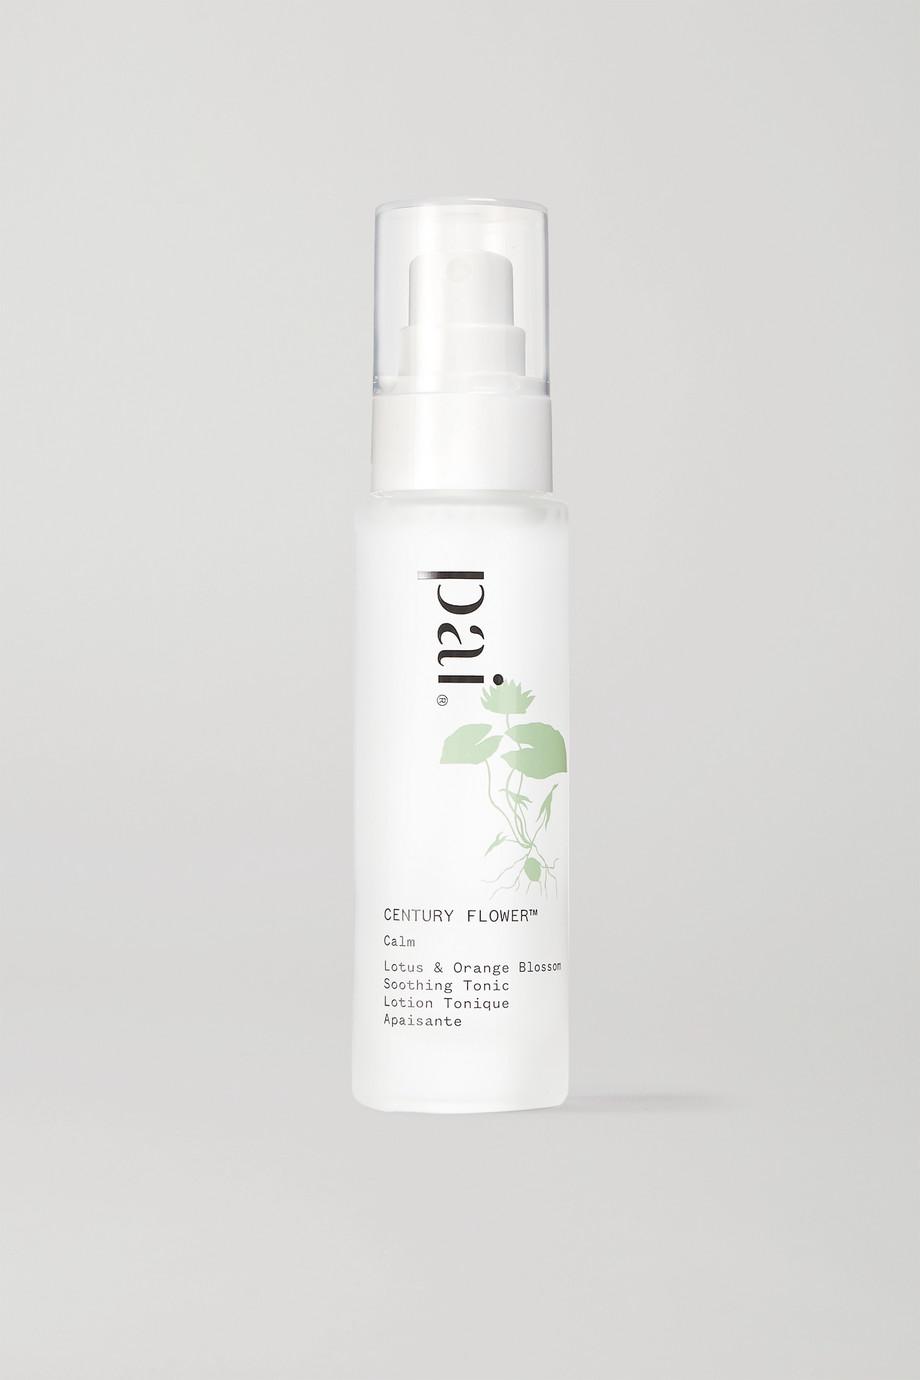 Pai Skincare + NET SUSTAIN Century Flower Lotus & Orange Blossom Soothing Tonic, 50 ml – Toner